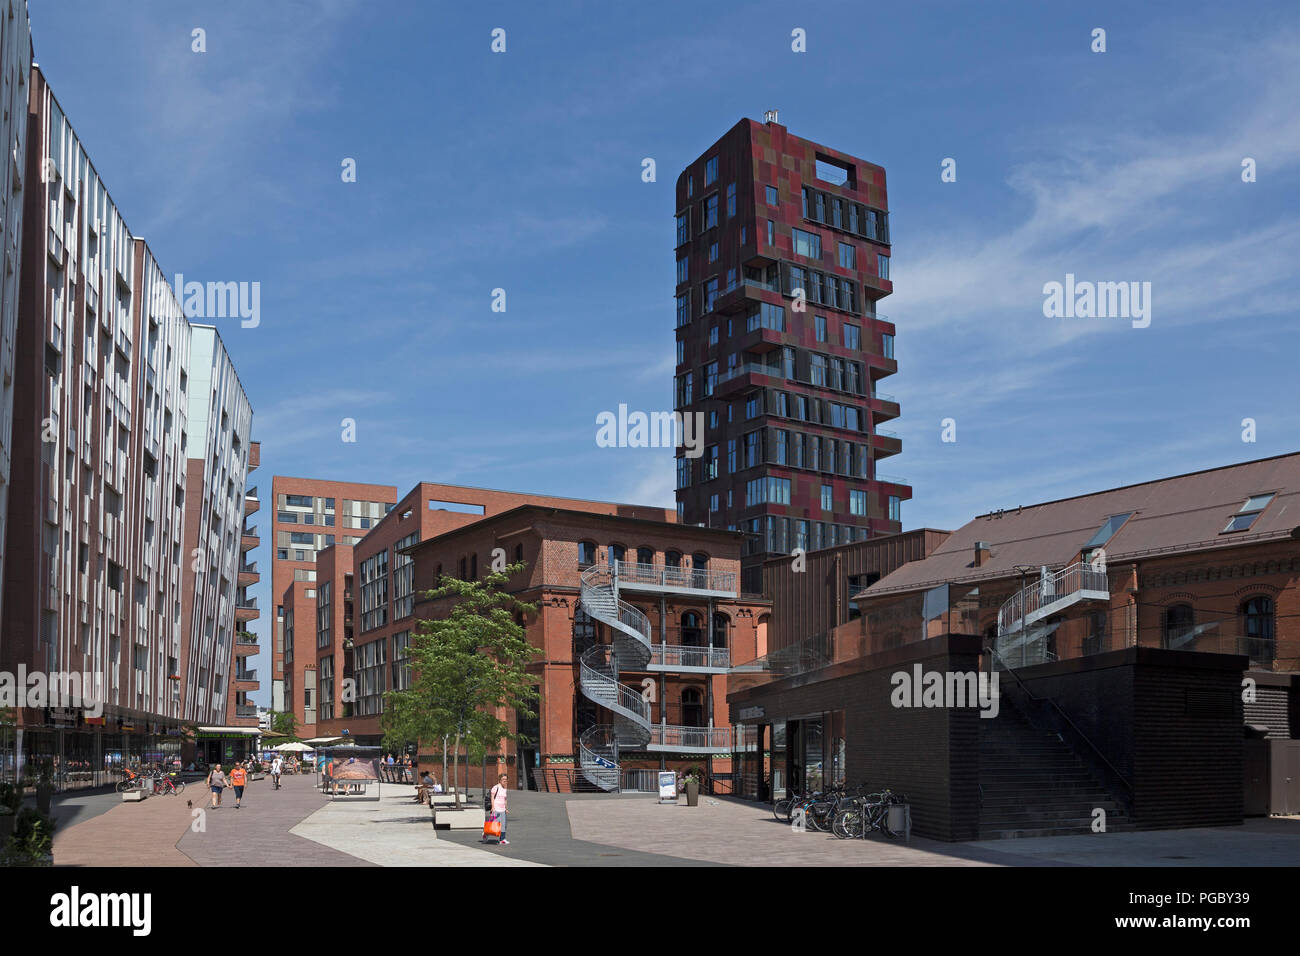 Ueberseeboulevard, HafenCity, HafenCity (Harbour City), Hamburg, Germany - Stock Image